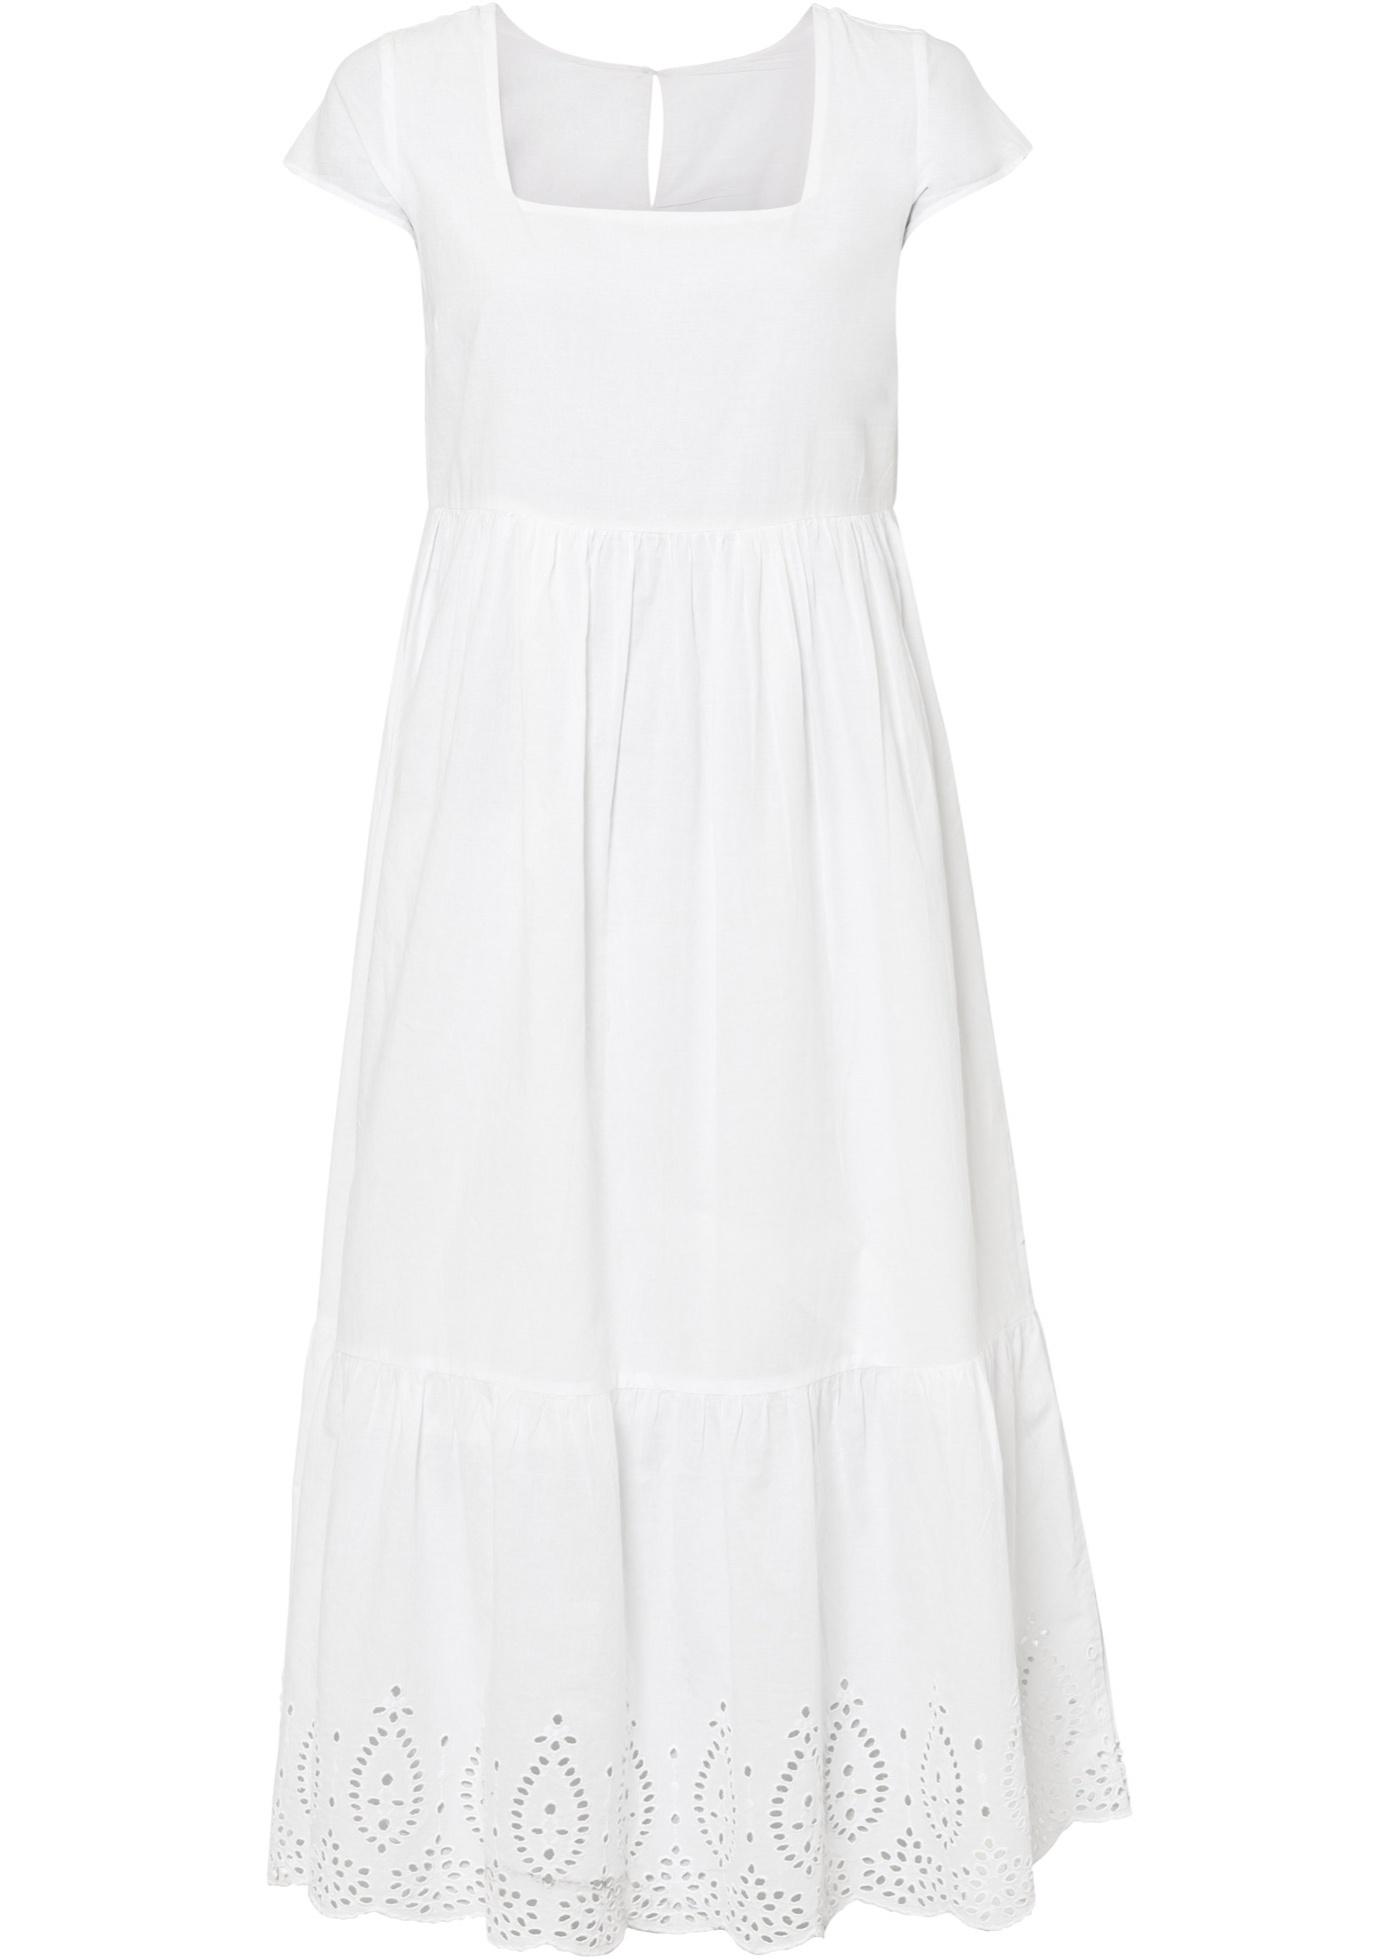 Levné Midi šaty s děrovanou výšivkou | Bílá barva šatů